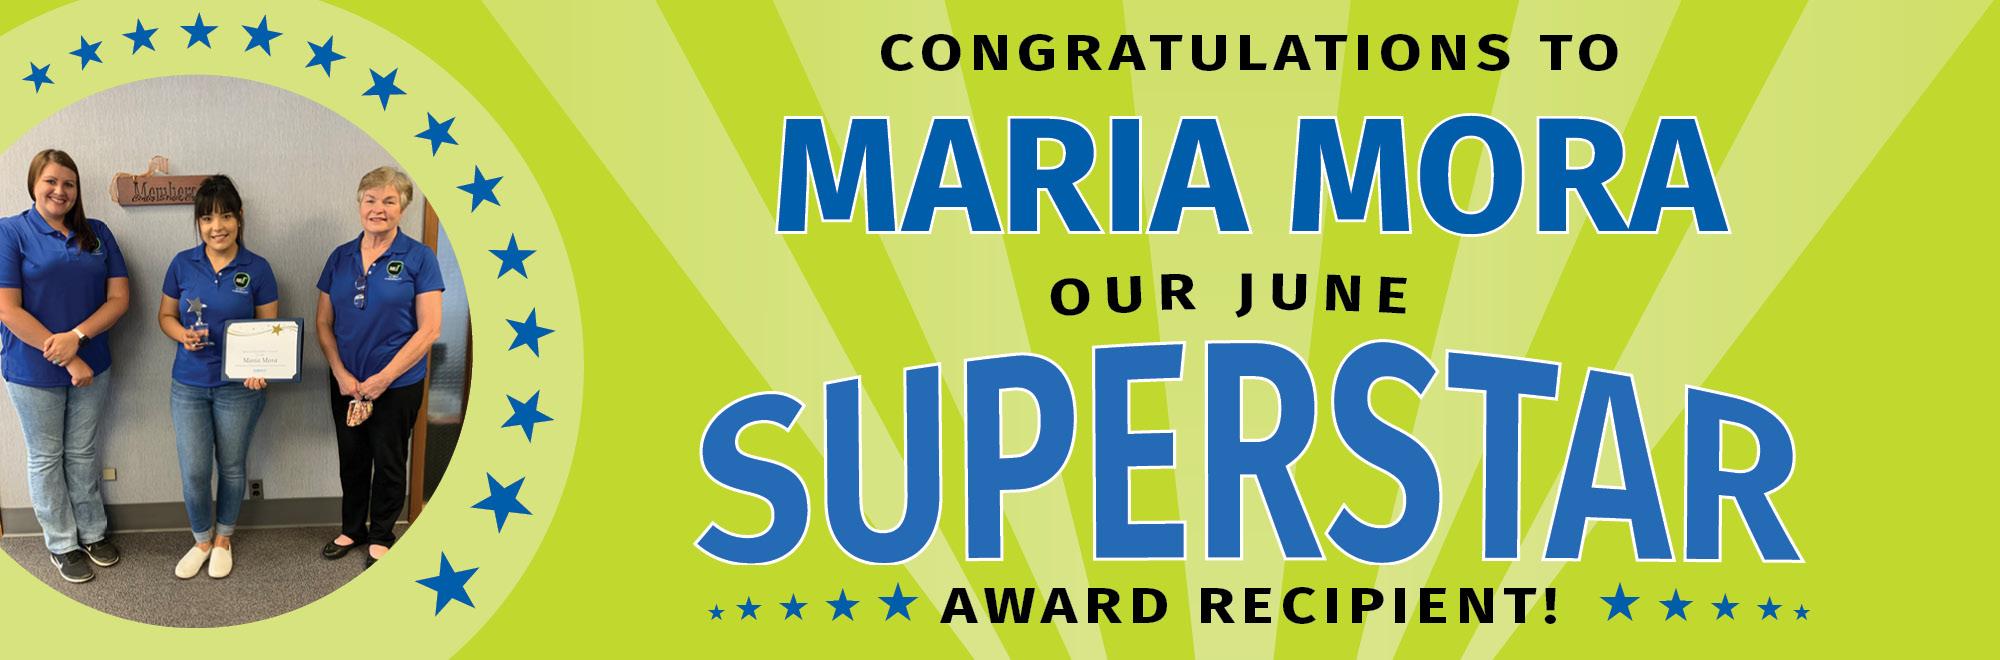 Maria Mora is our June Superstar award recipient!